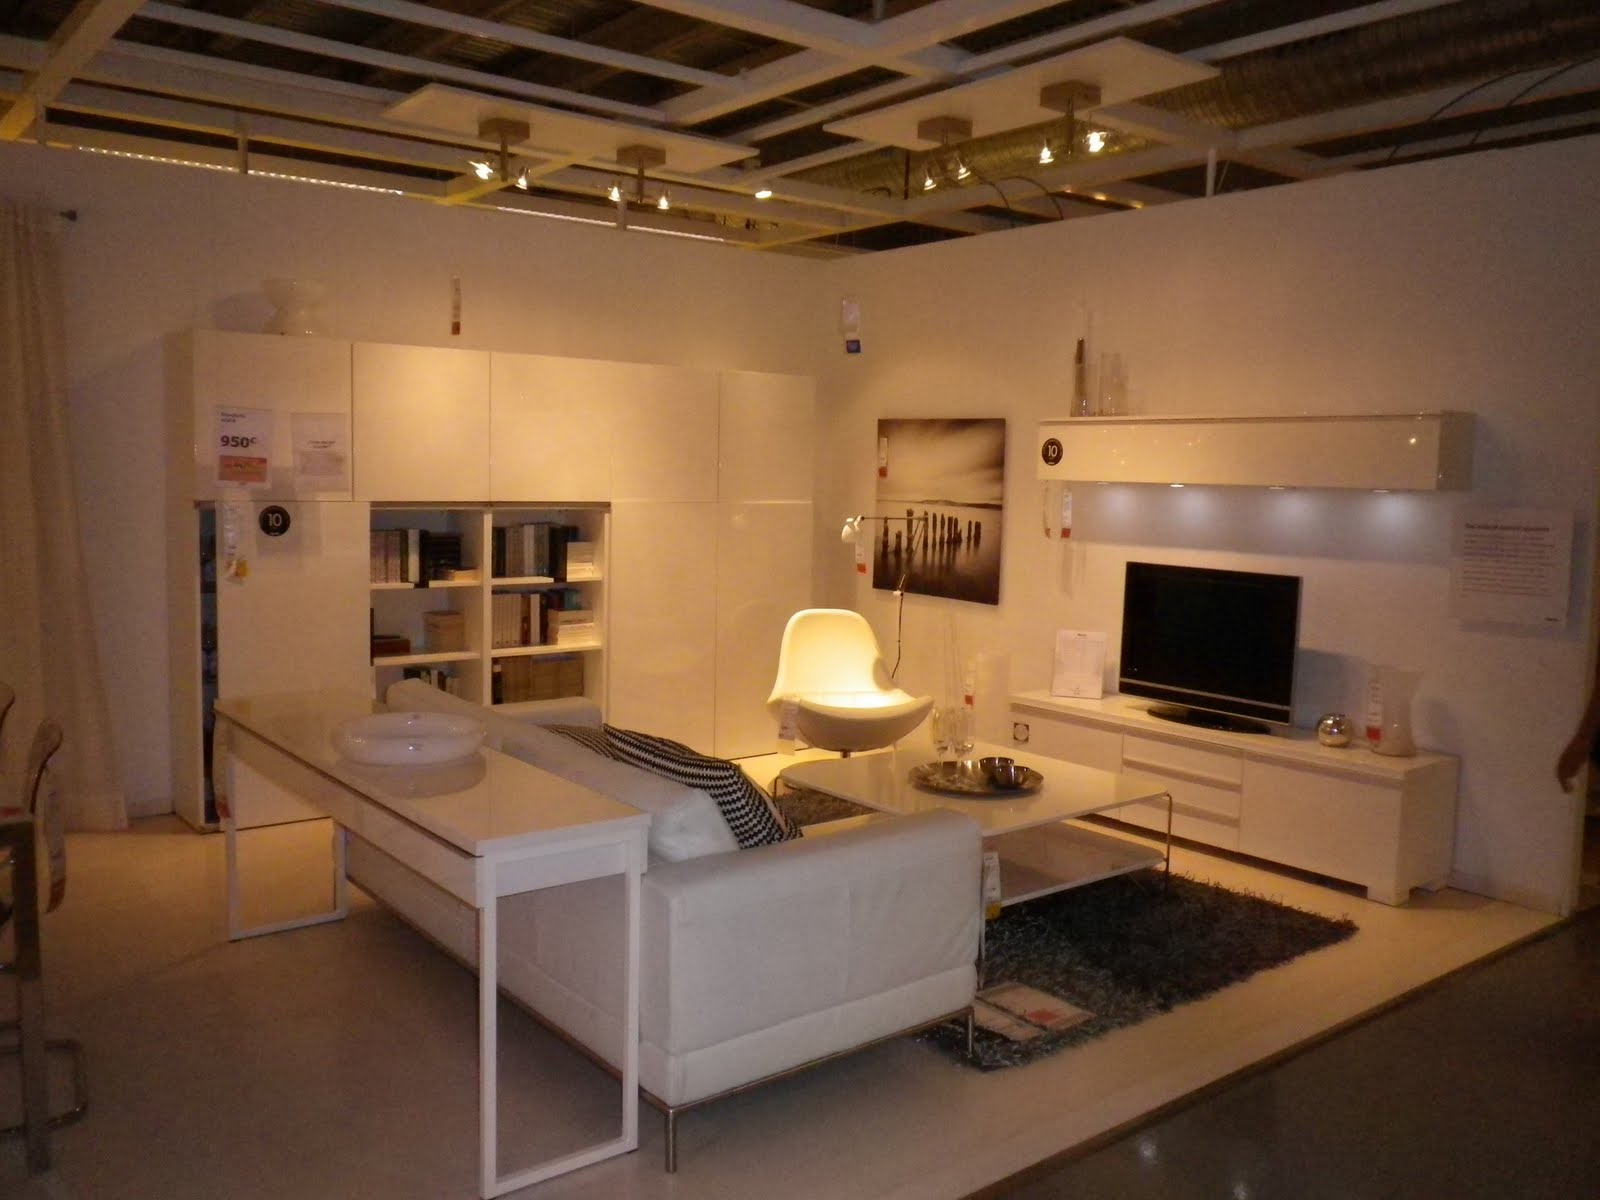 Salones Besta de Ikea Madrid del Este III  x4duroscom